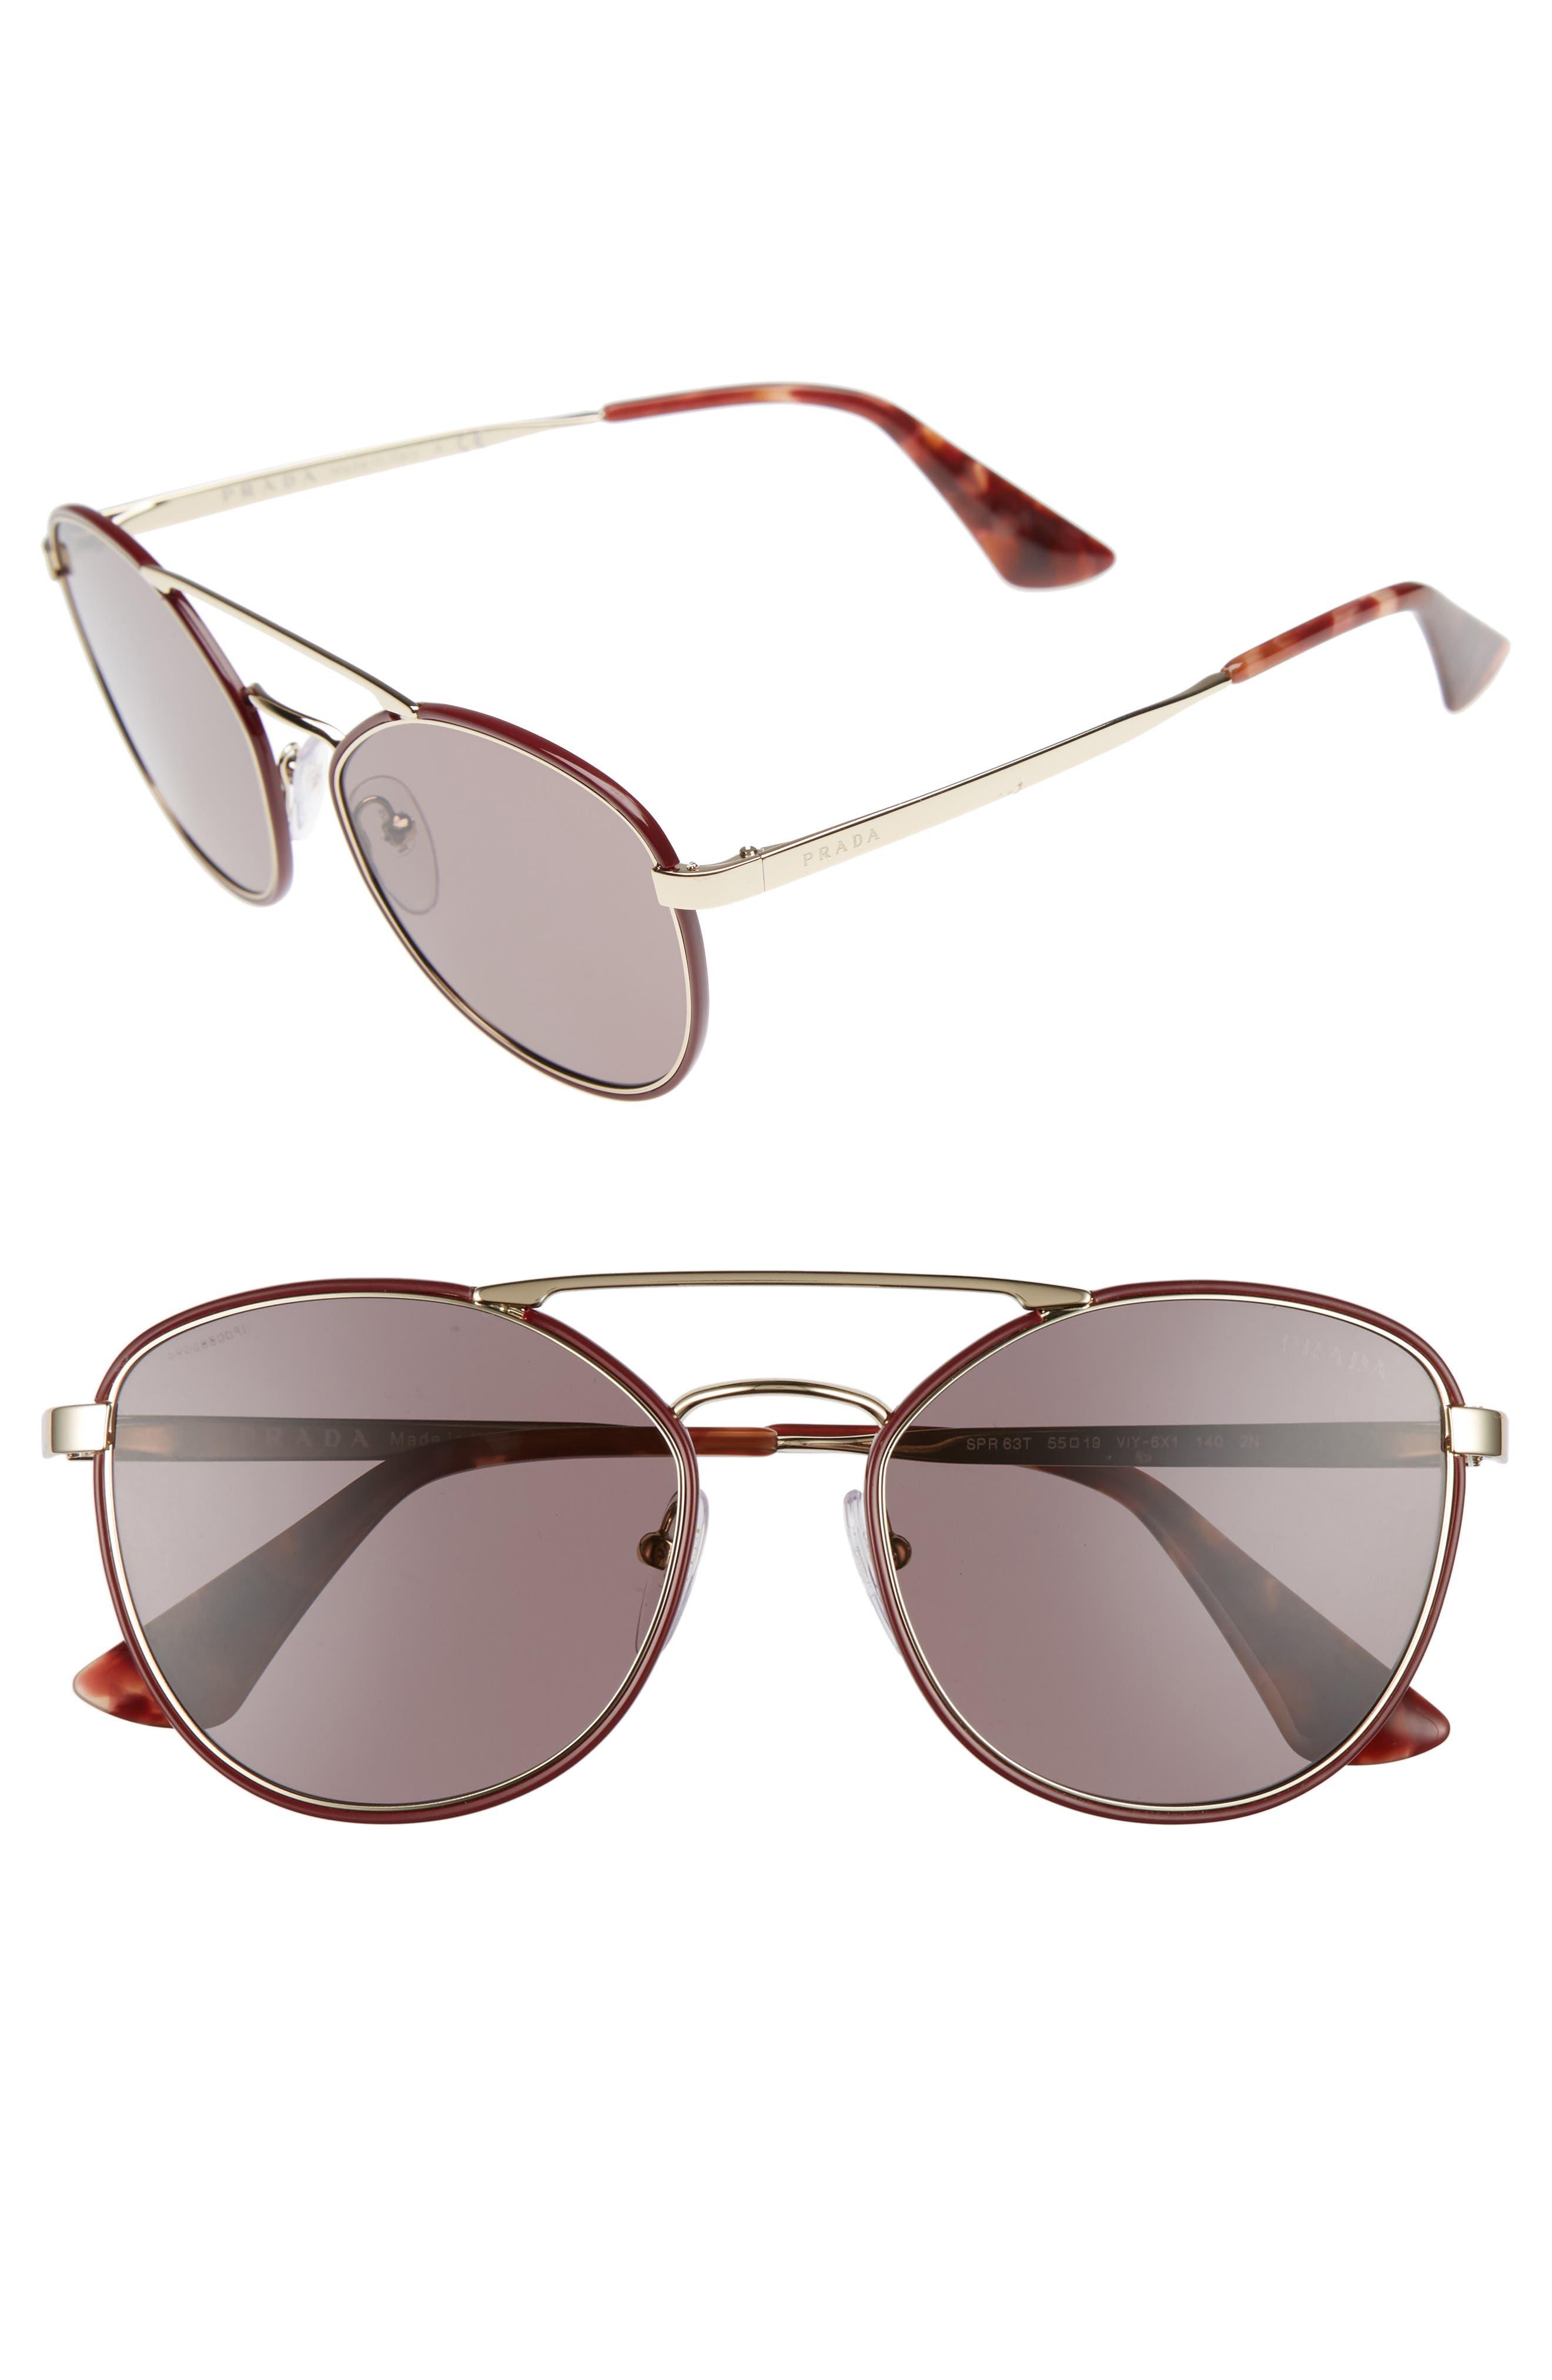 Main Image - Prada 55mm Metal Aviator Sunglasses